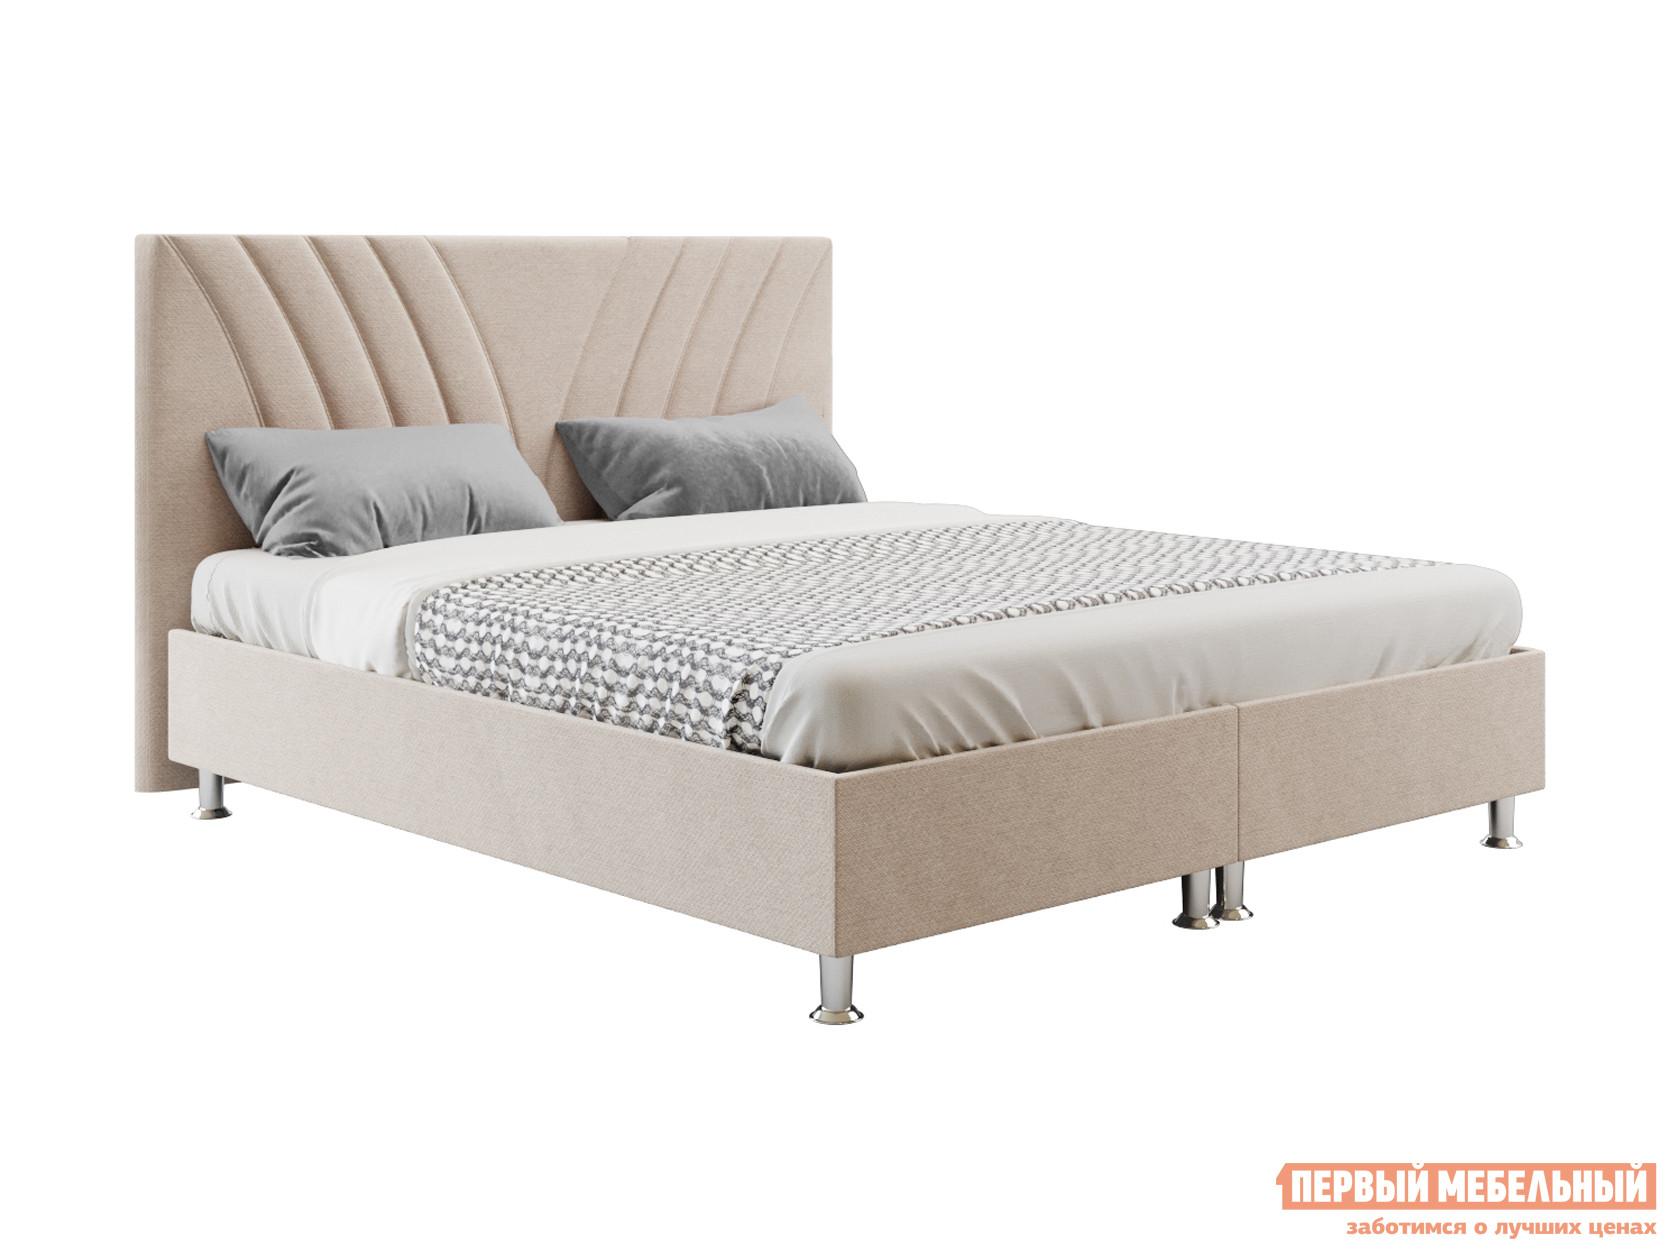 Двуспальная кровать  Версо с подъемным механизмом 140х200, 160х200, 180х200, 200х200 Бежевый, 140х200 см Беллона 117322